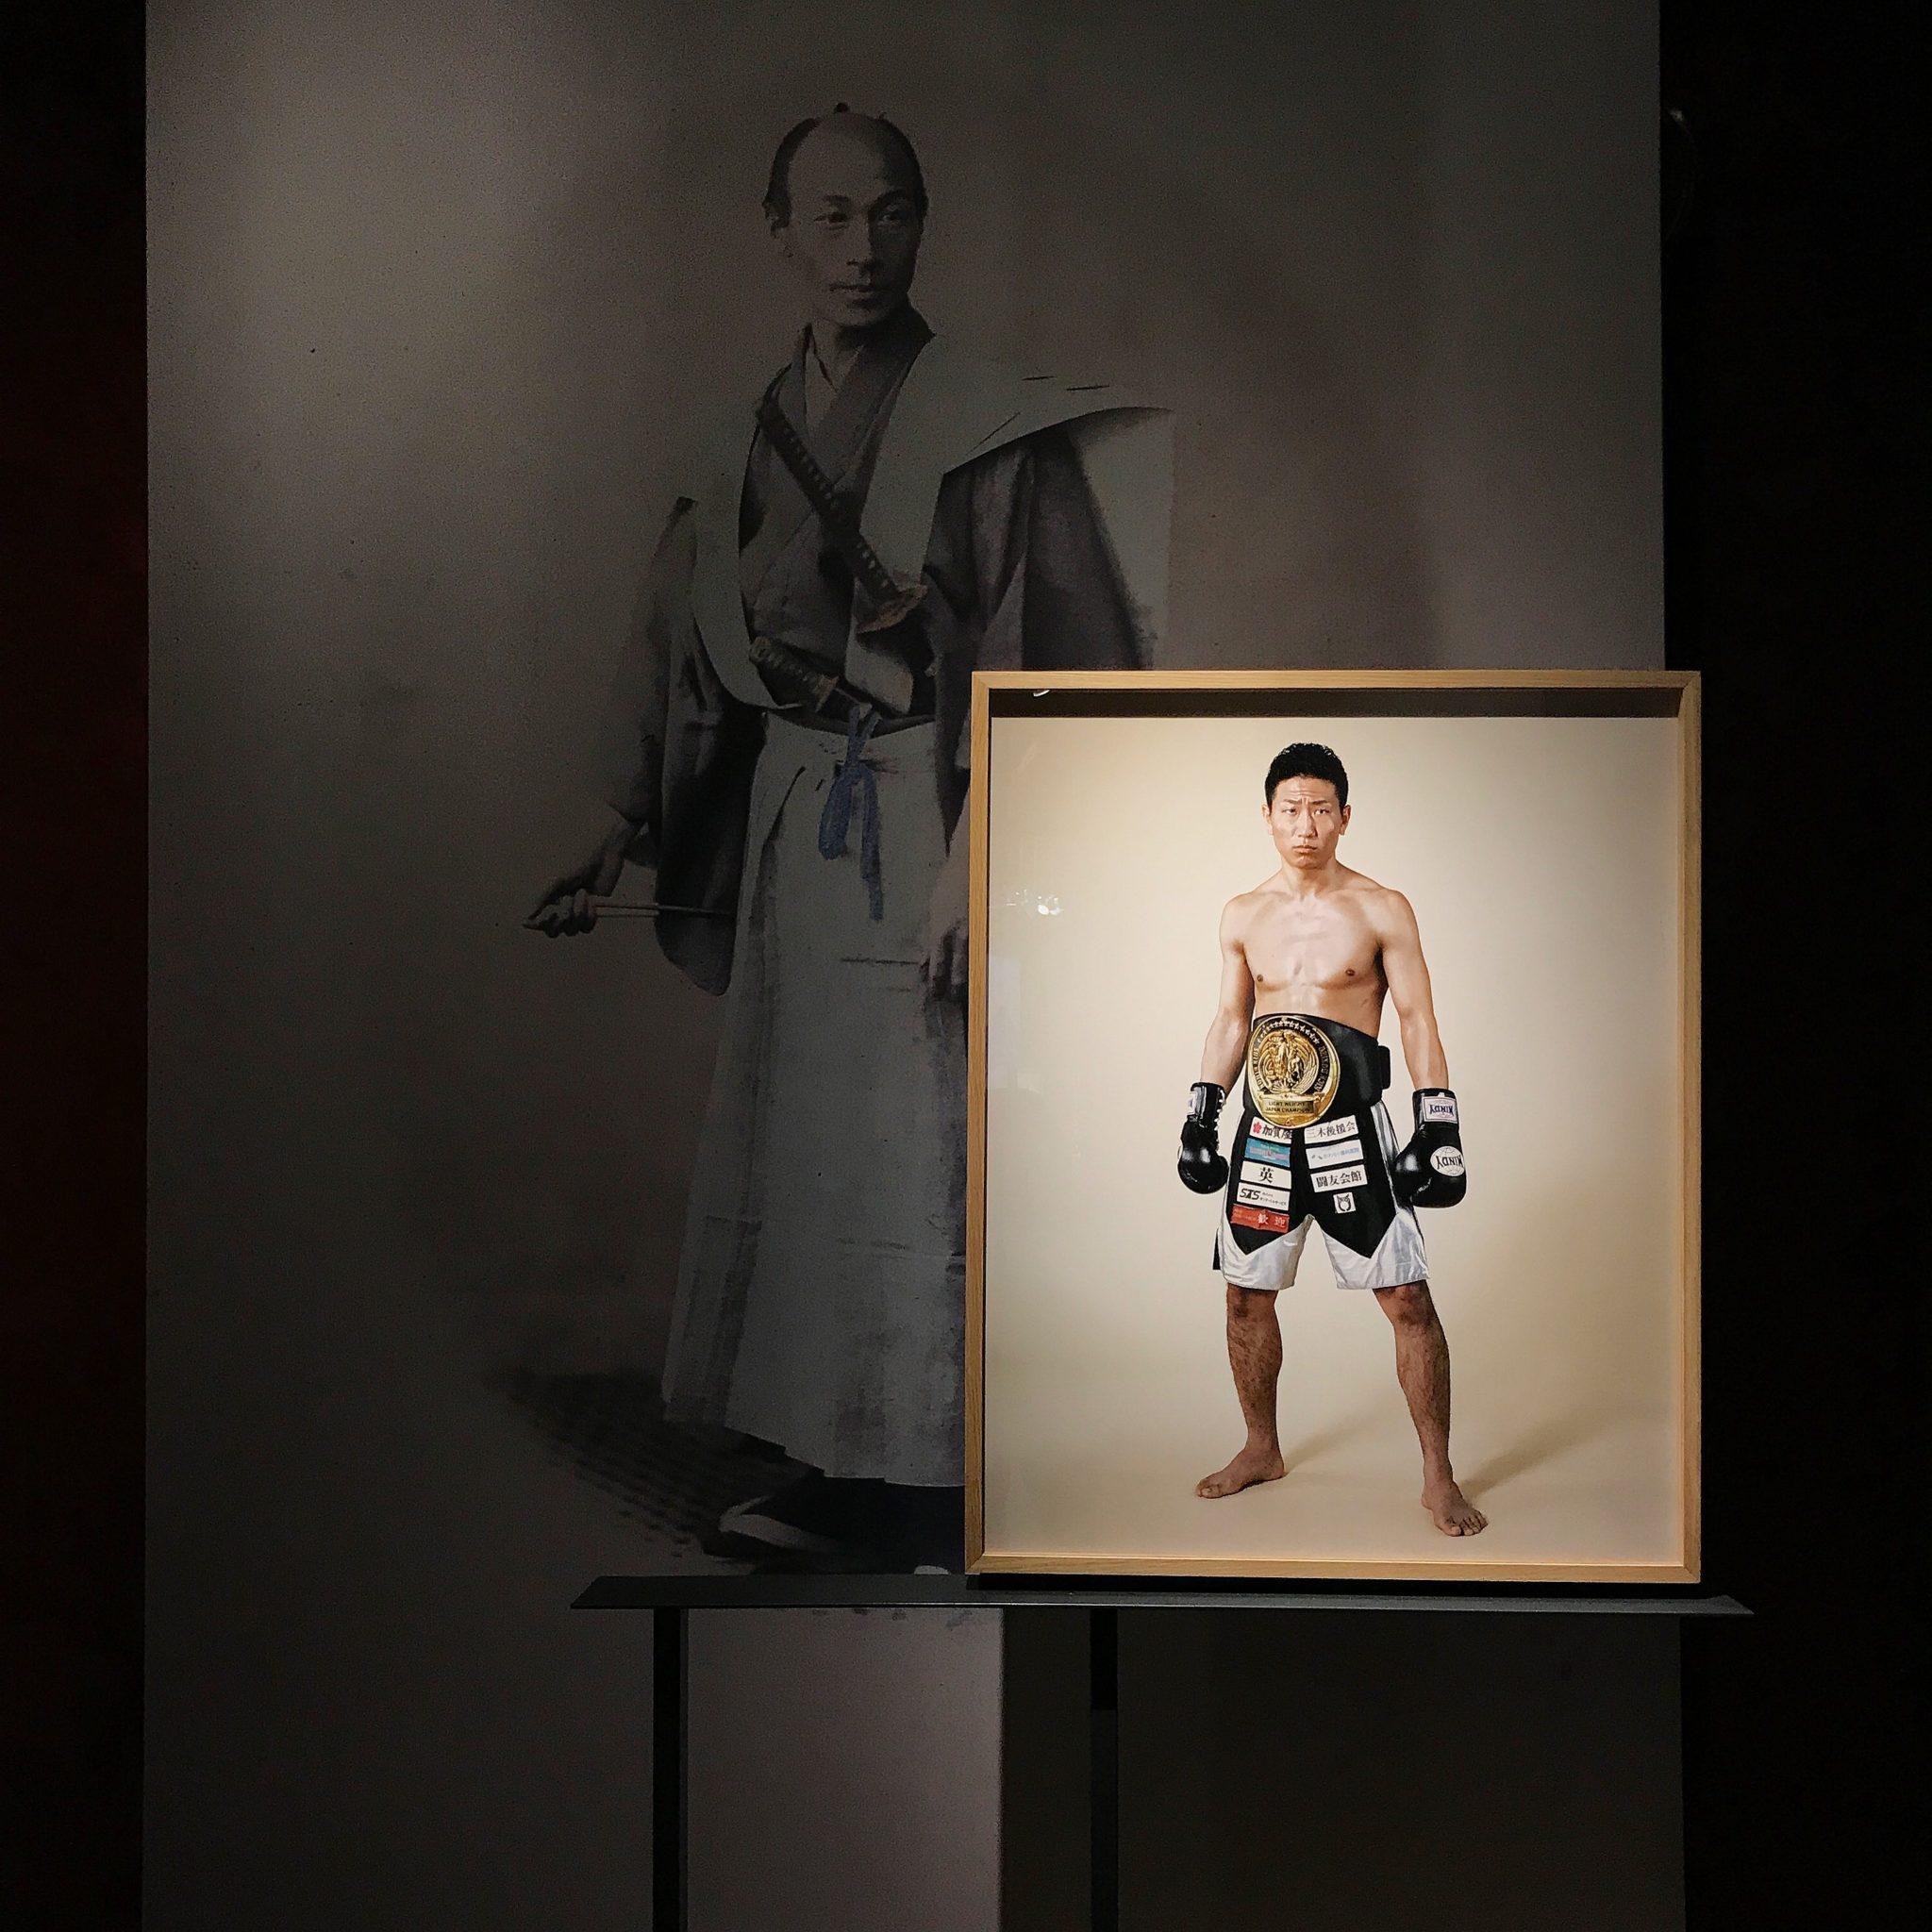 guerriero giapponese tra le mostre gratis milano